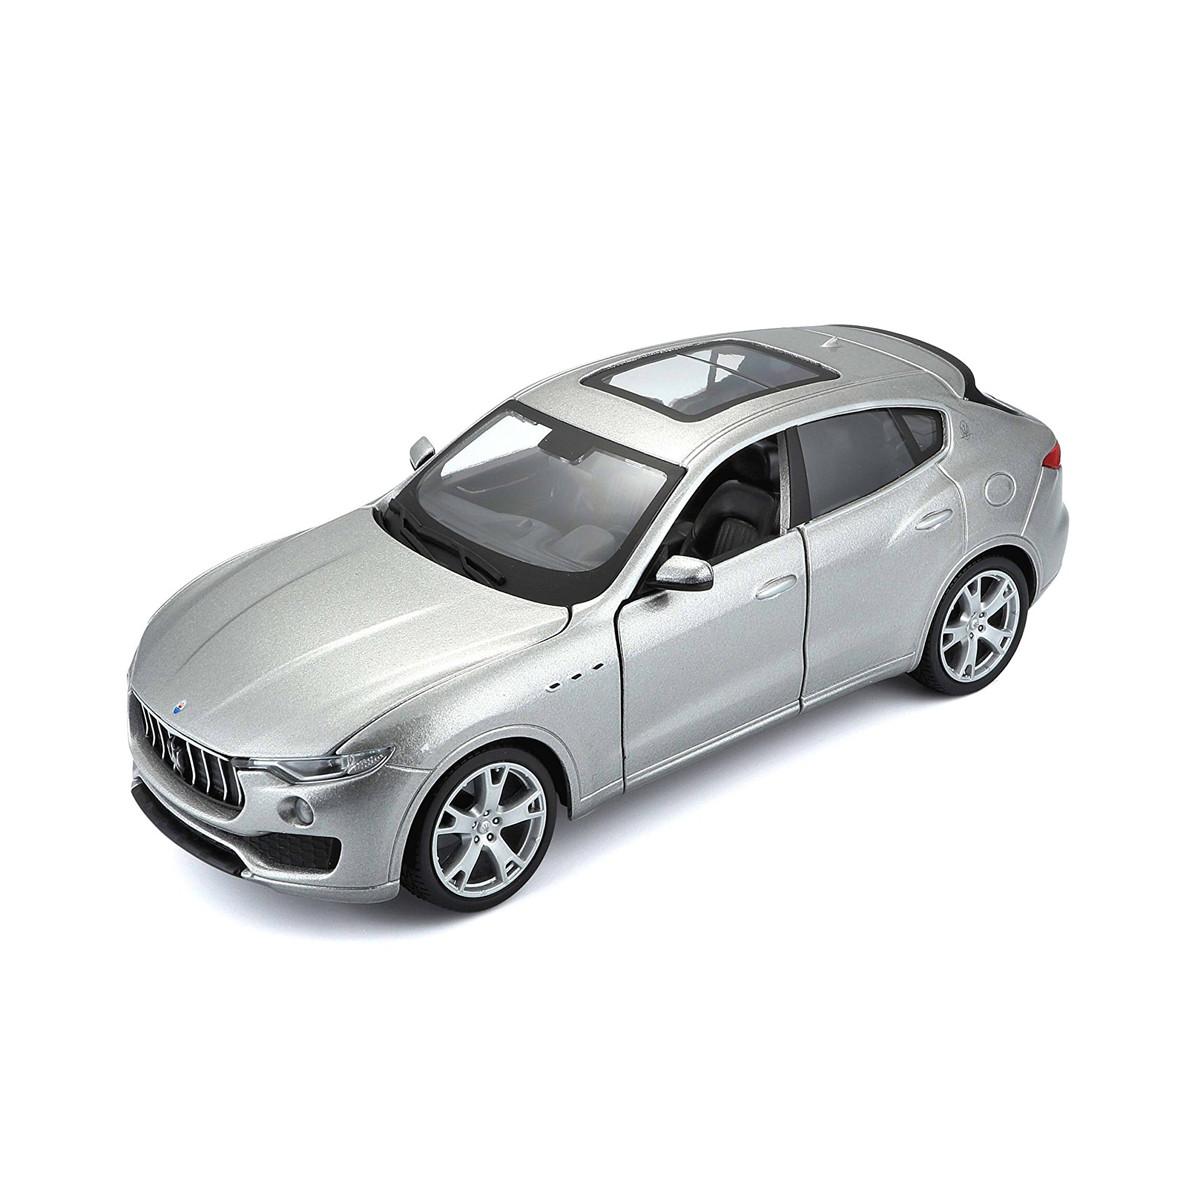 Автомодель - Maserati Levante